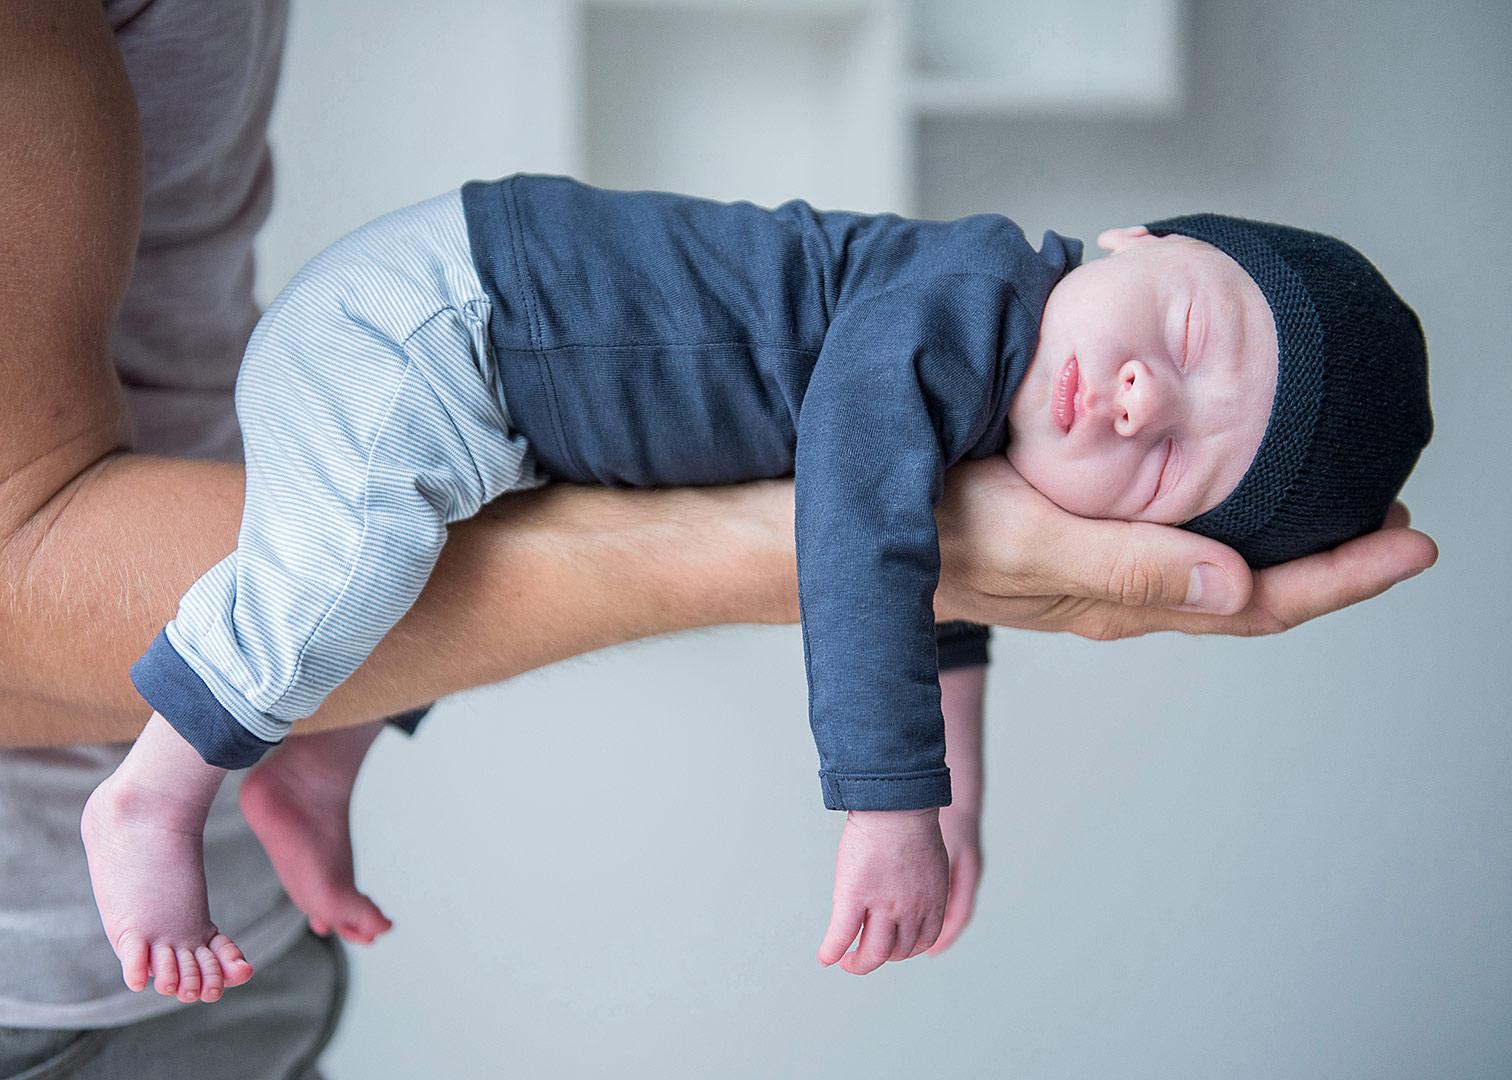 neugeborenenfotoshooting berlin, babyfotos zuhause, babyfotograf berlin